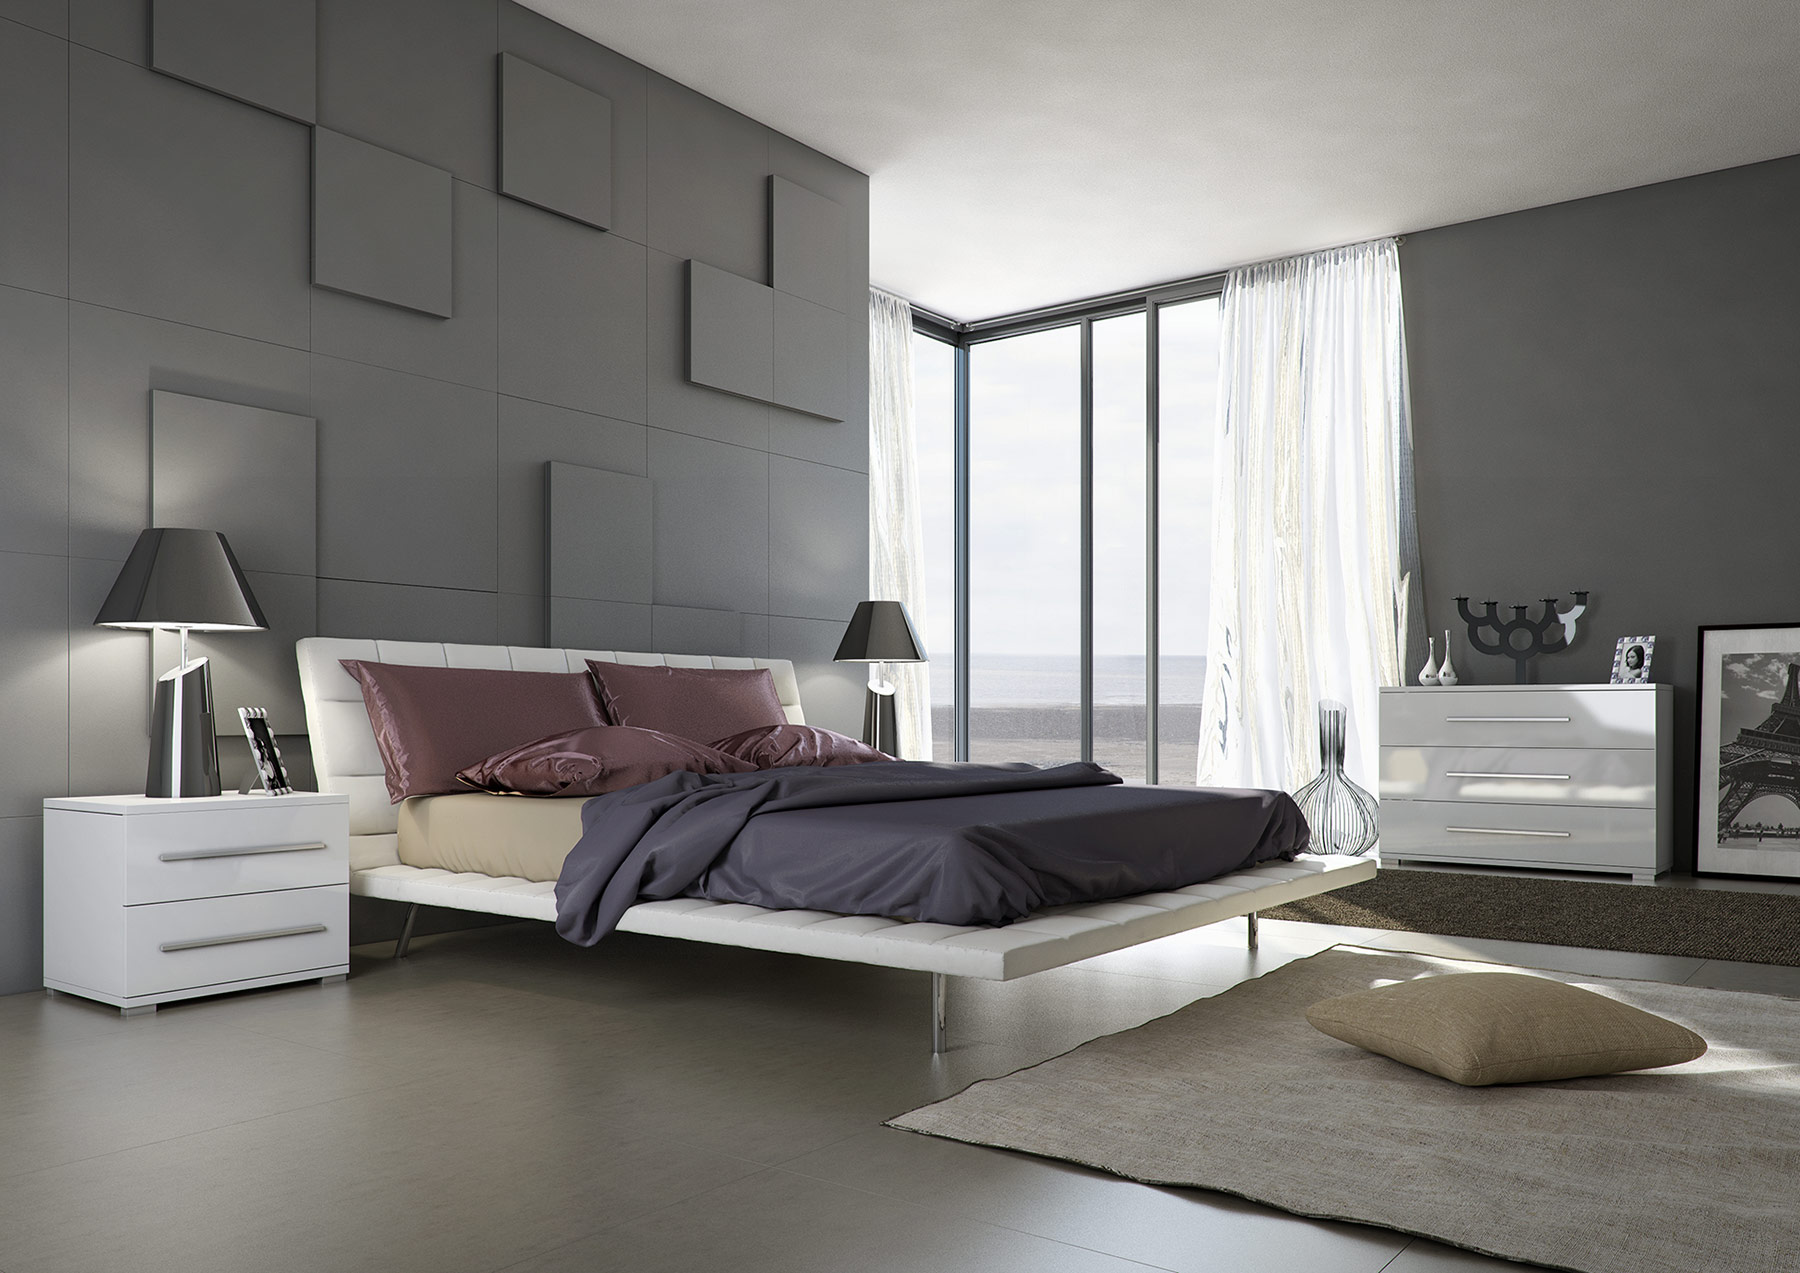 Wall Cladding Panels : Conturmuri wall panels render worx d visualisation cape